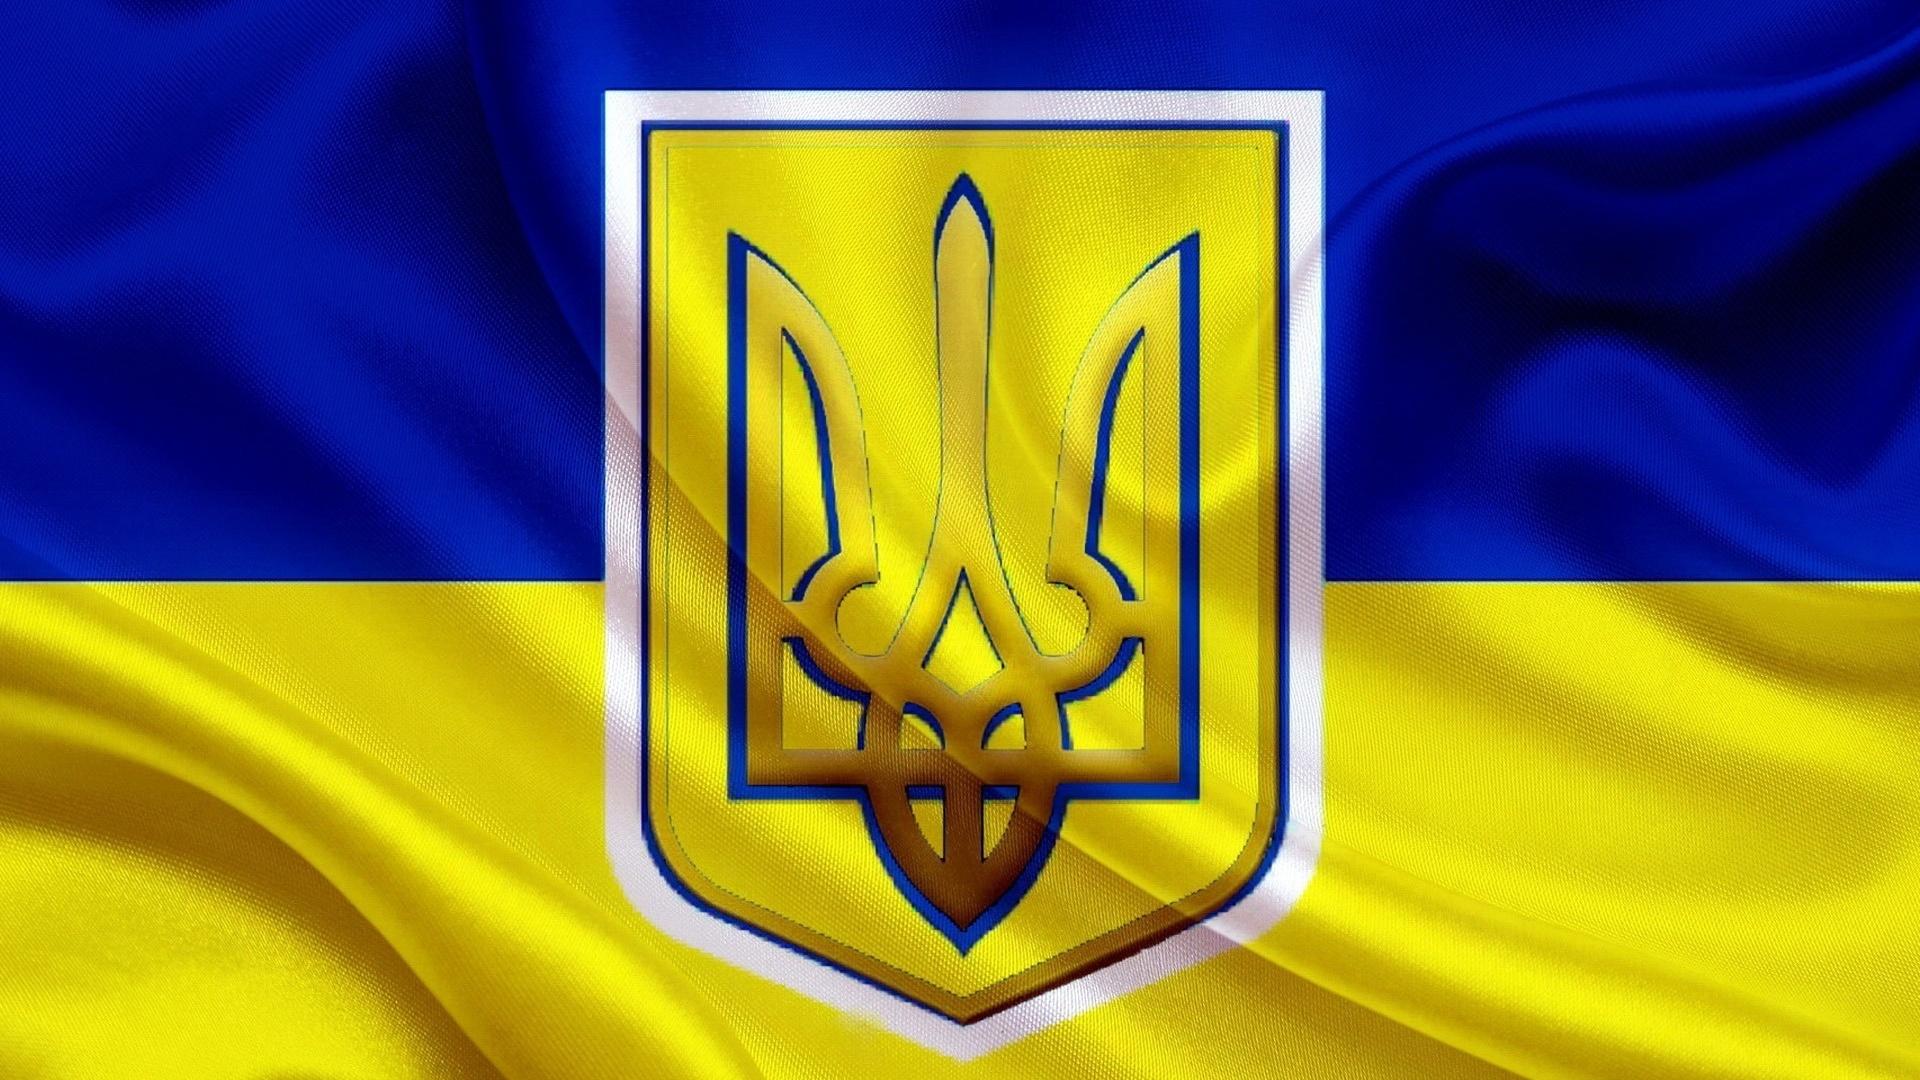 киеве картинка на фоне украинского флага любой город